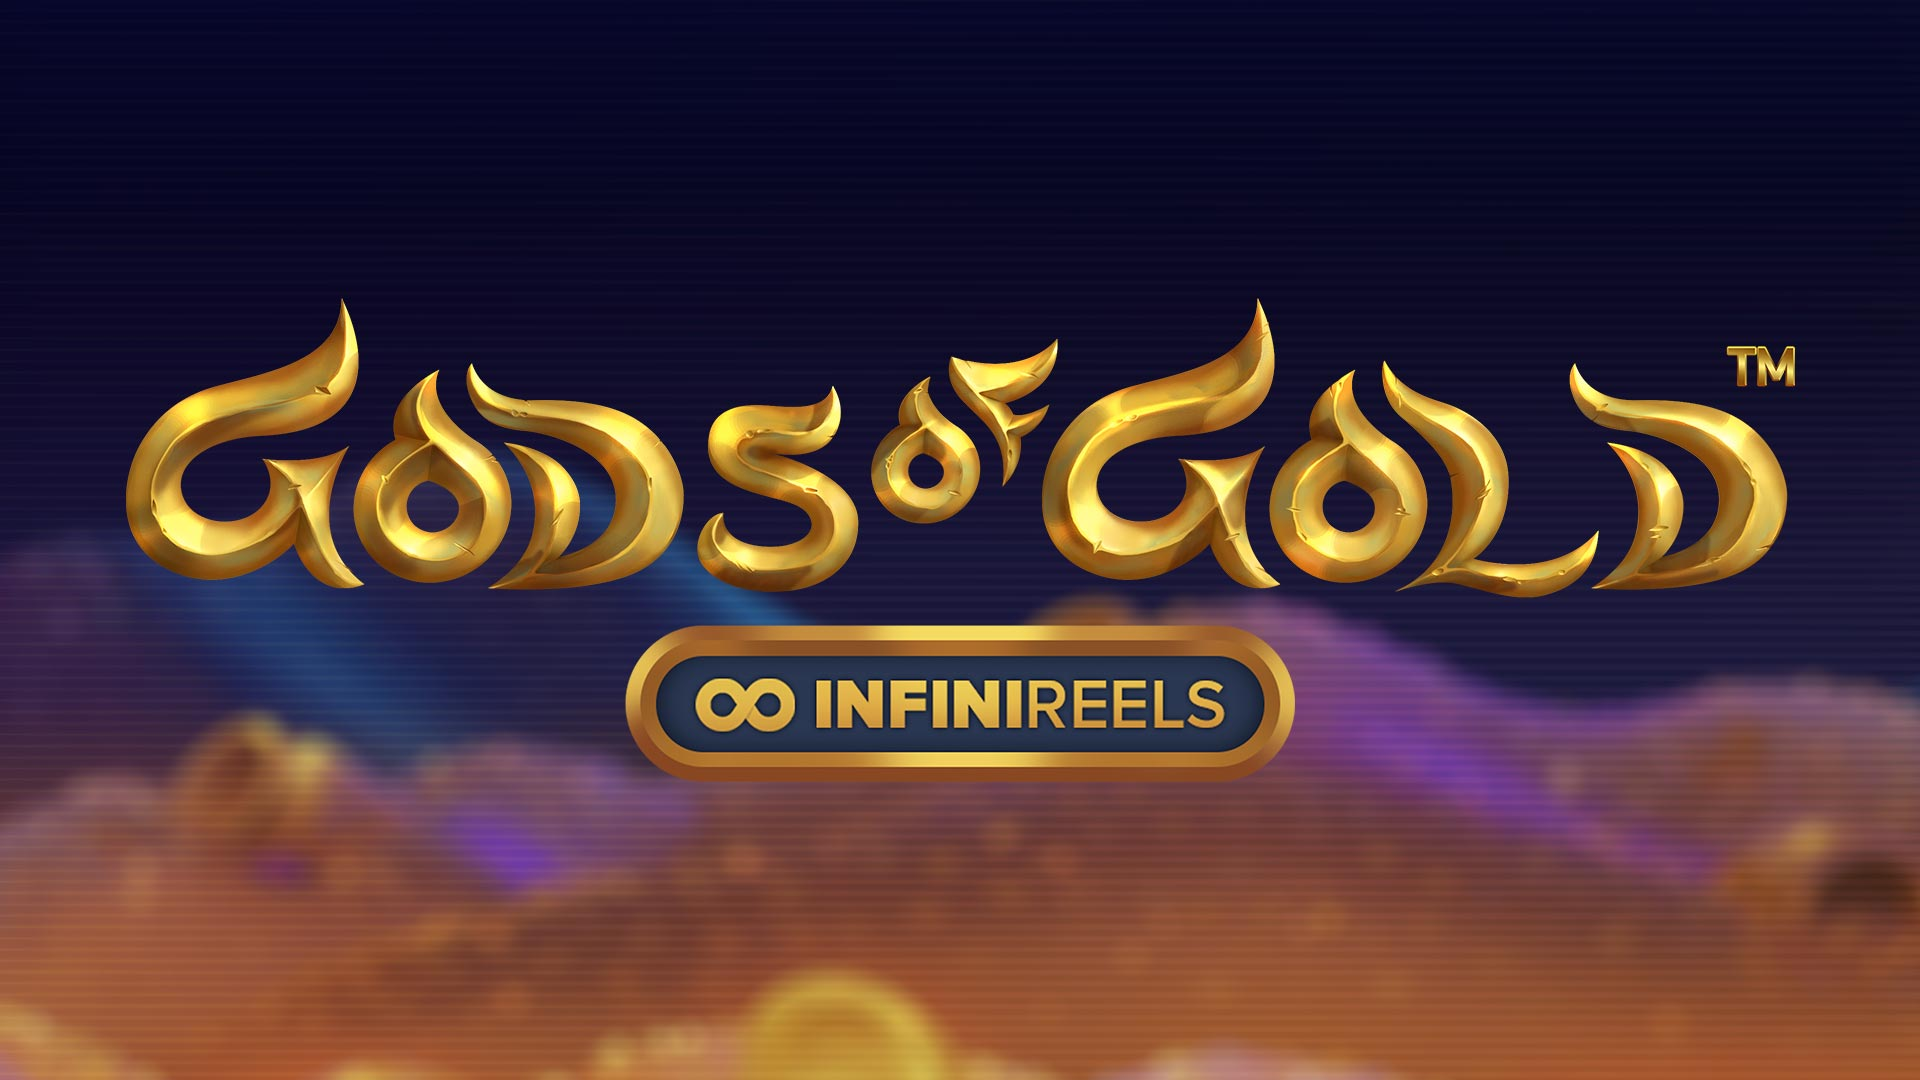 Gods of Gold Infinreels